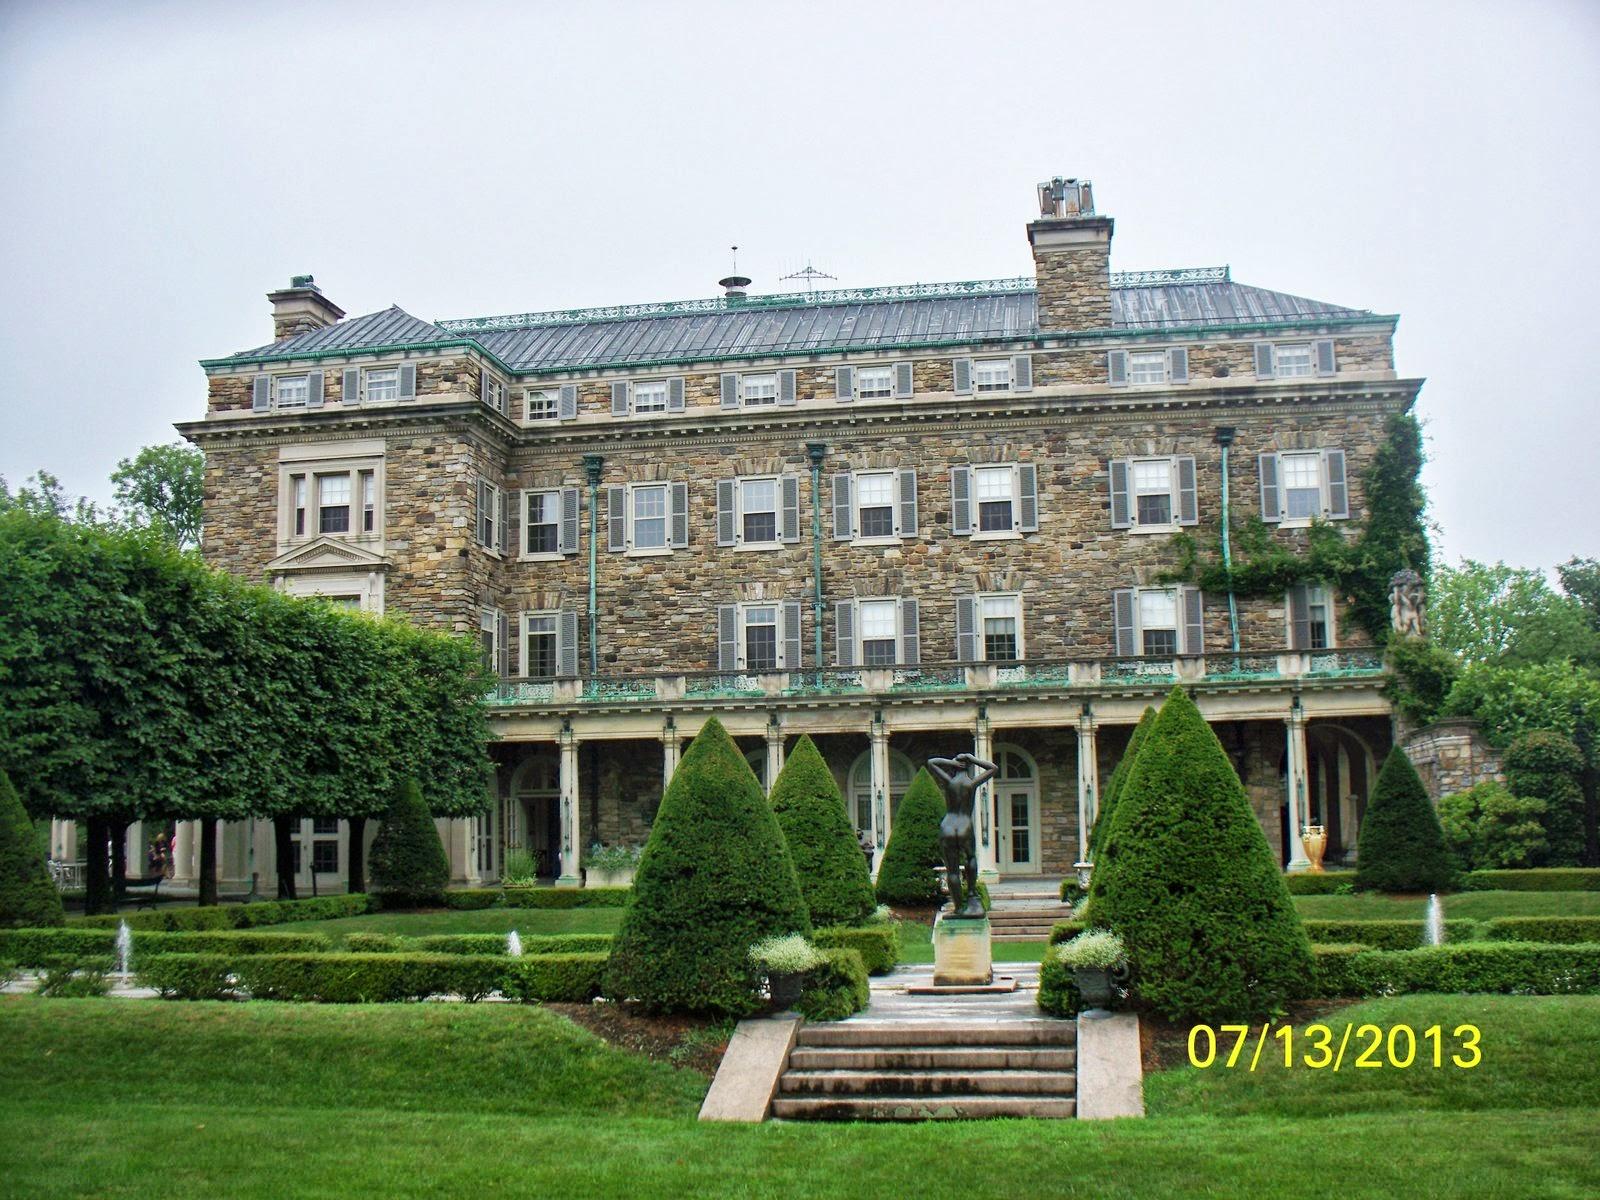 Nanseann Day 272 July 13 Kykuit The Rockefeller Estate